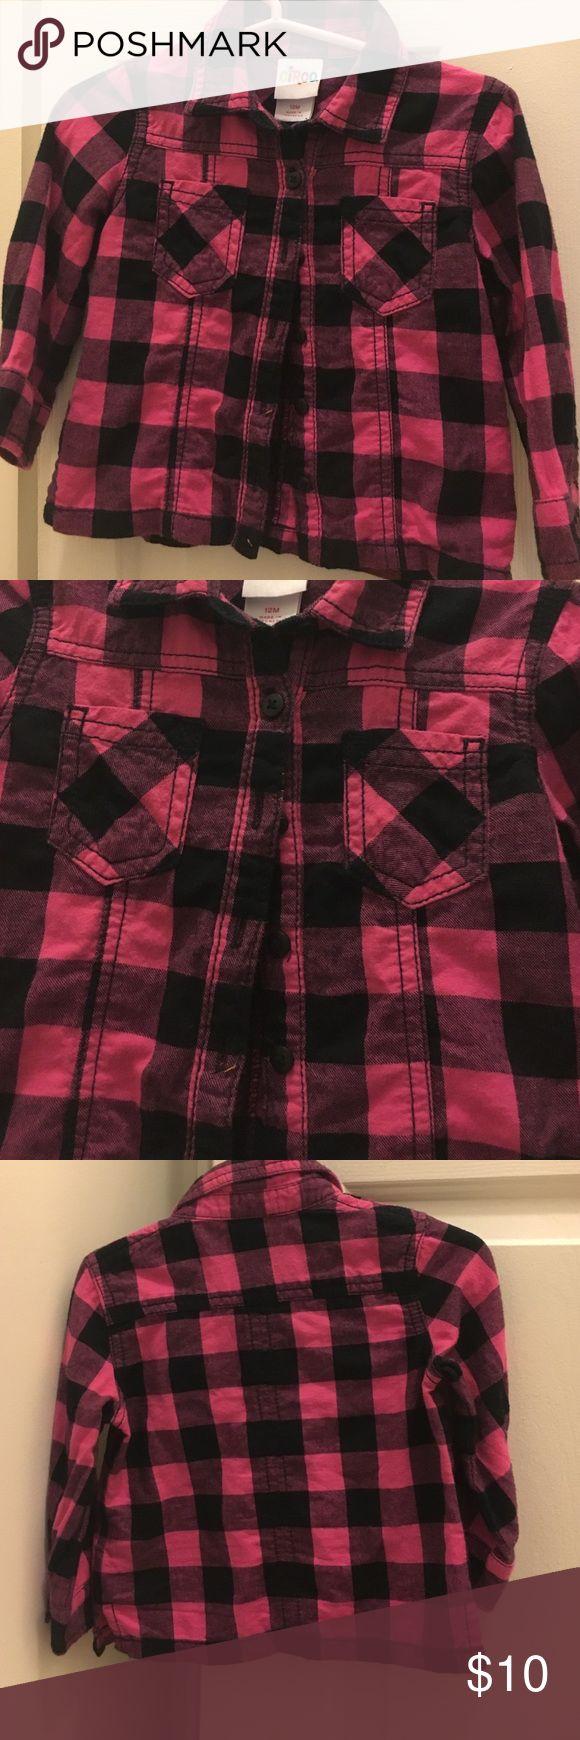 Pink and Black Plaid Shirt gently used adorable girls plaid shirt 12M Circo Tops Button Down Shirts